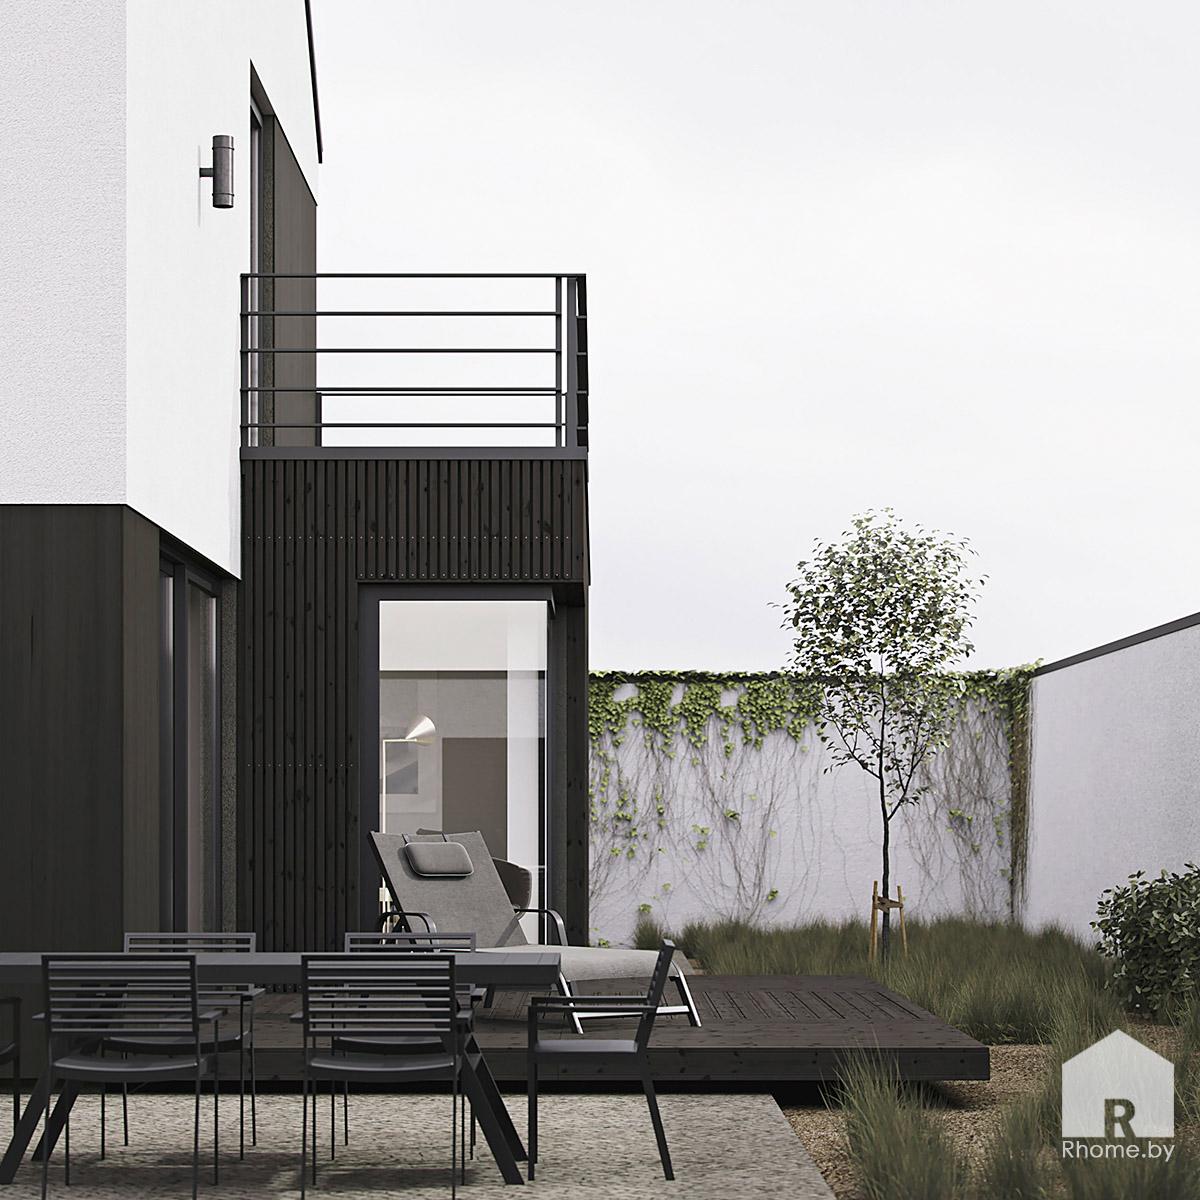 Дом в стиле барнхаус | Дизайн студия – Rhome.by